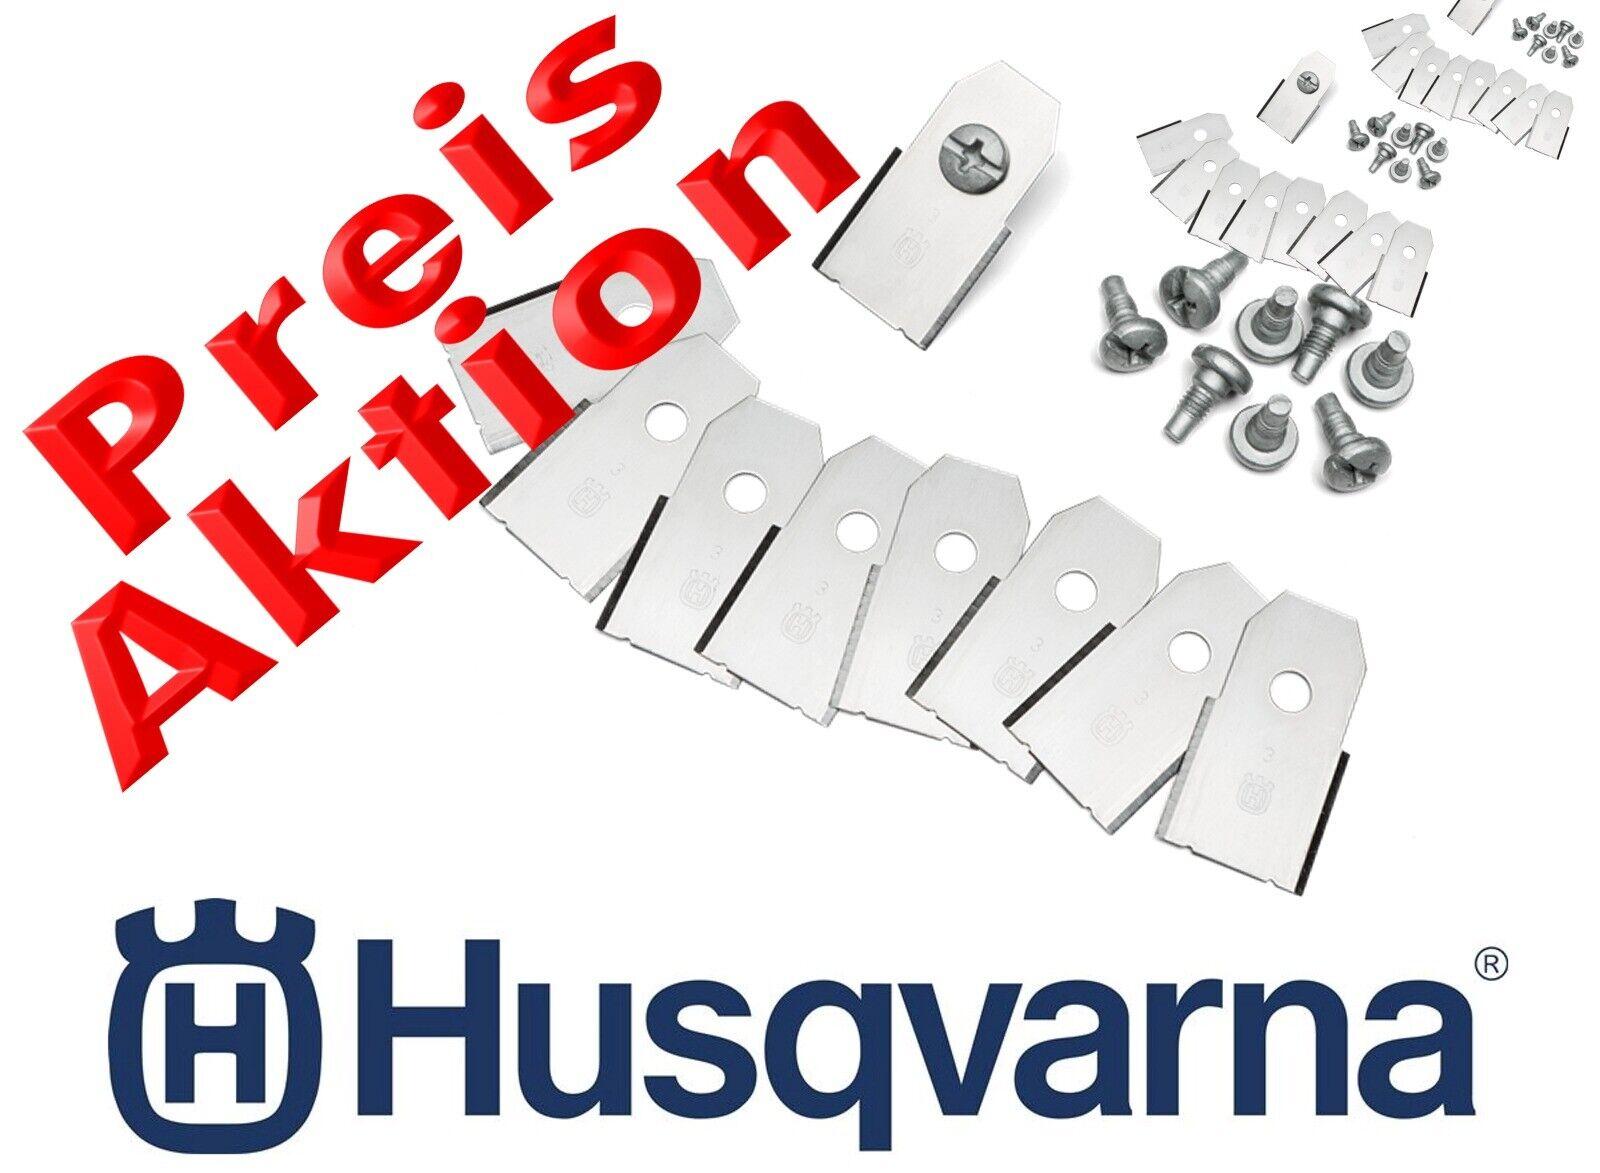 TITAN*** Ti3 Ersatz-Messer Klingen Husqvarna Automower 105 310 315 420 430x 450x